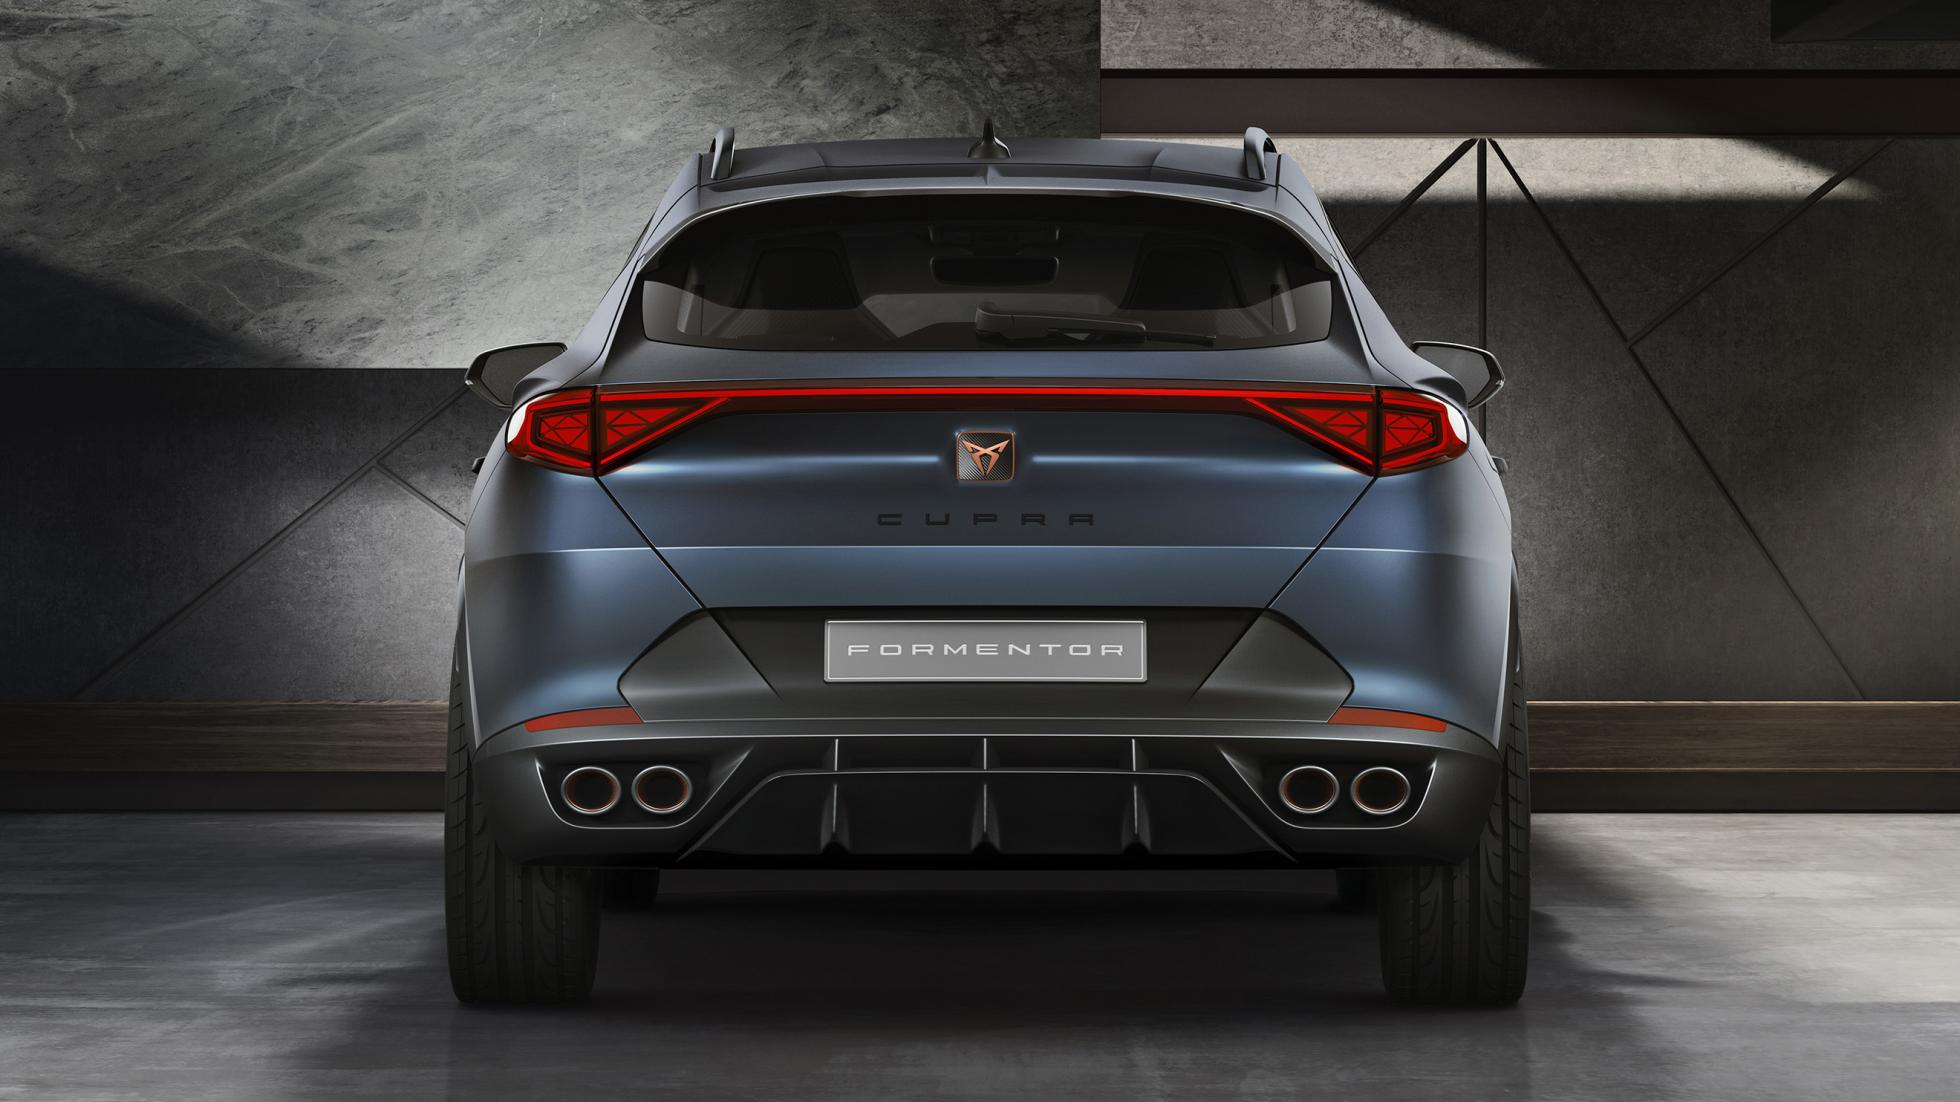 Le Cupra Formentor n'est pas un Seat Tarraco coupé hybride - Galerie